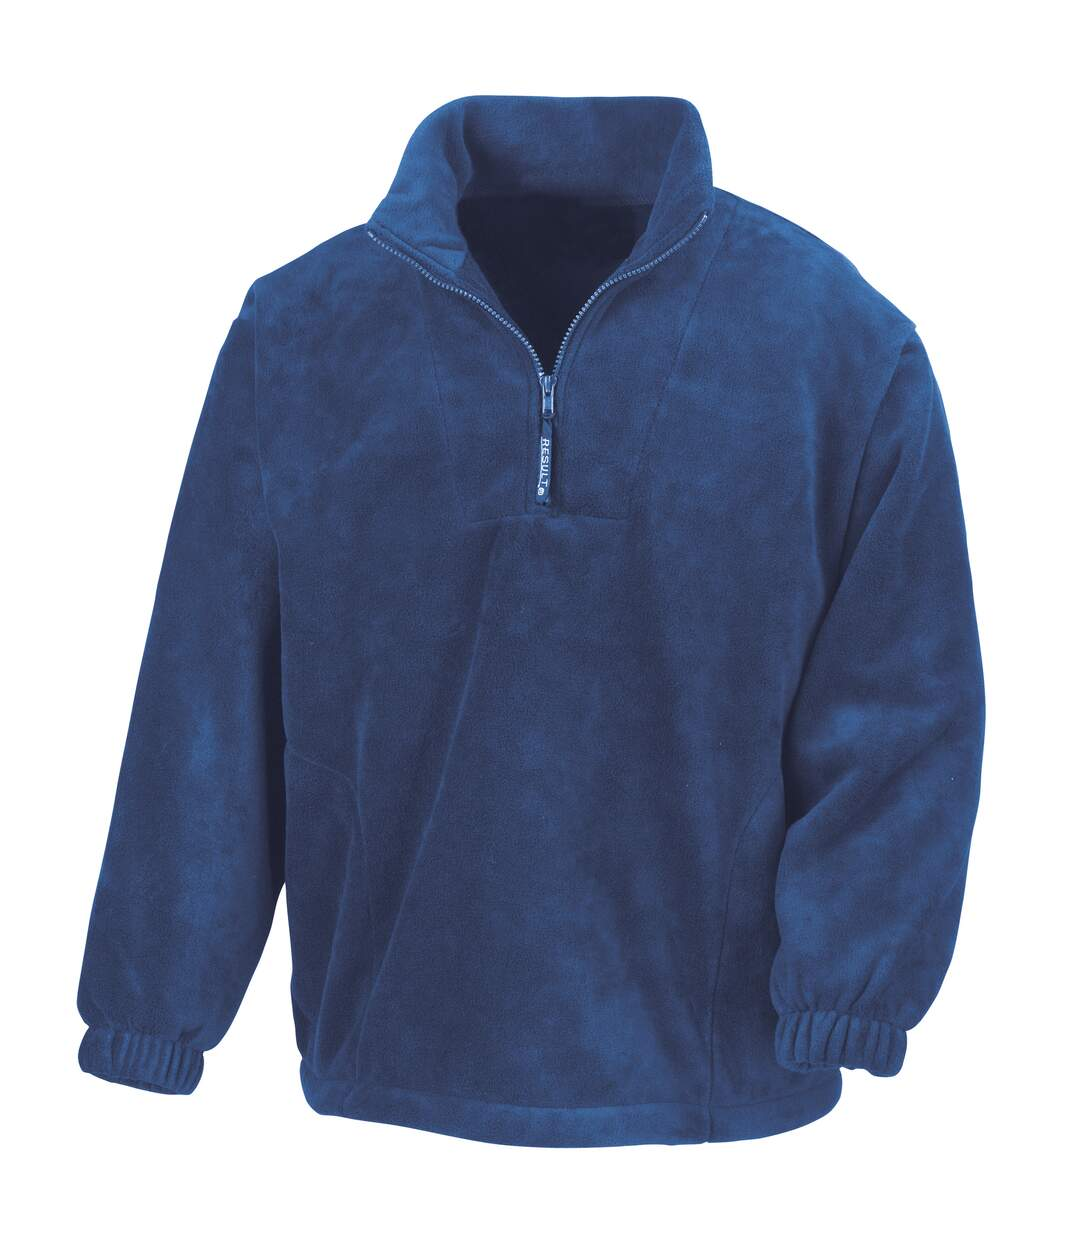 Result Unlined Active 1/4 Zip Anti-Pilling Fleece Top (Royal) - UTBC920